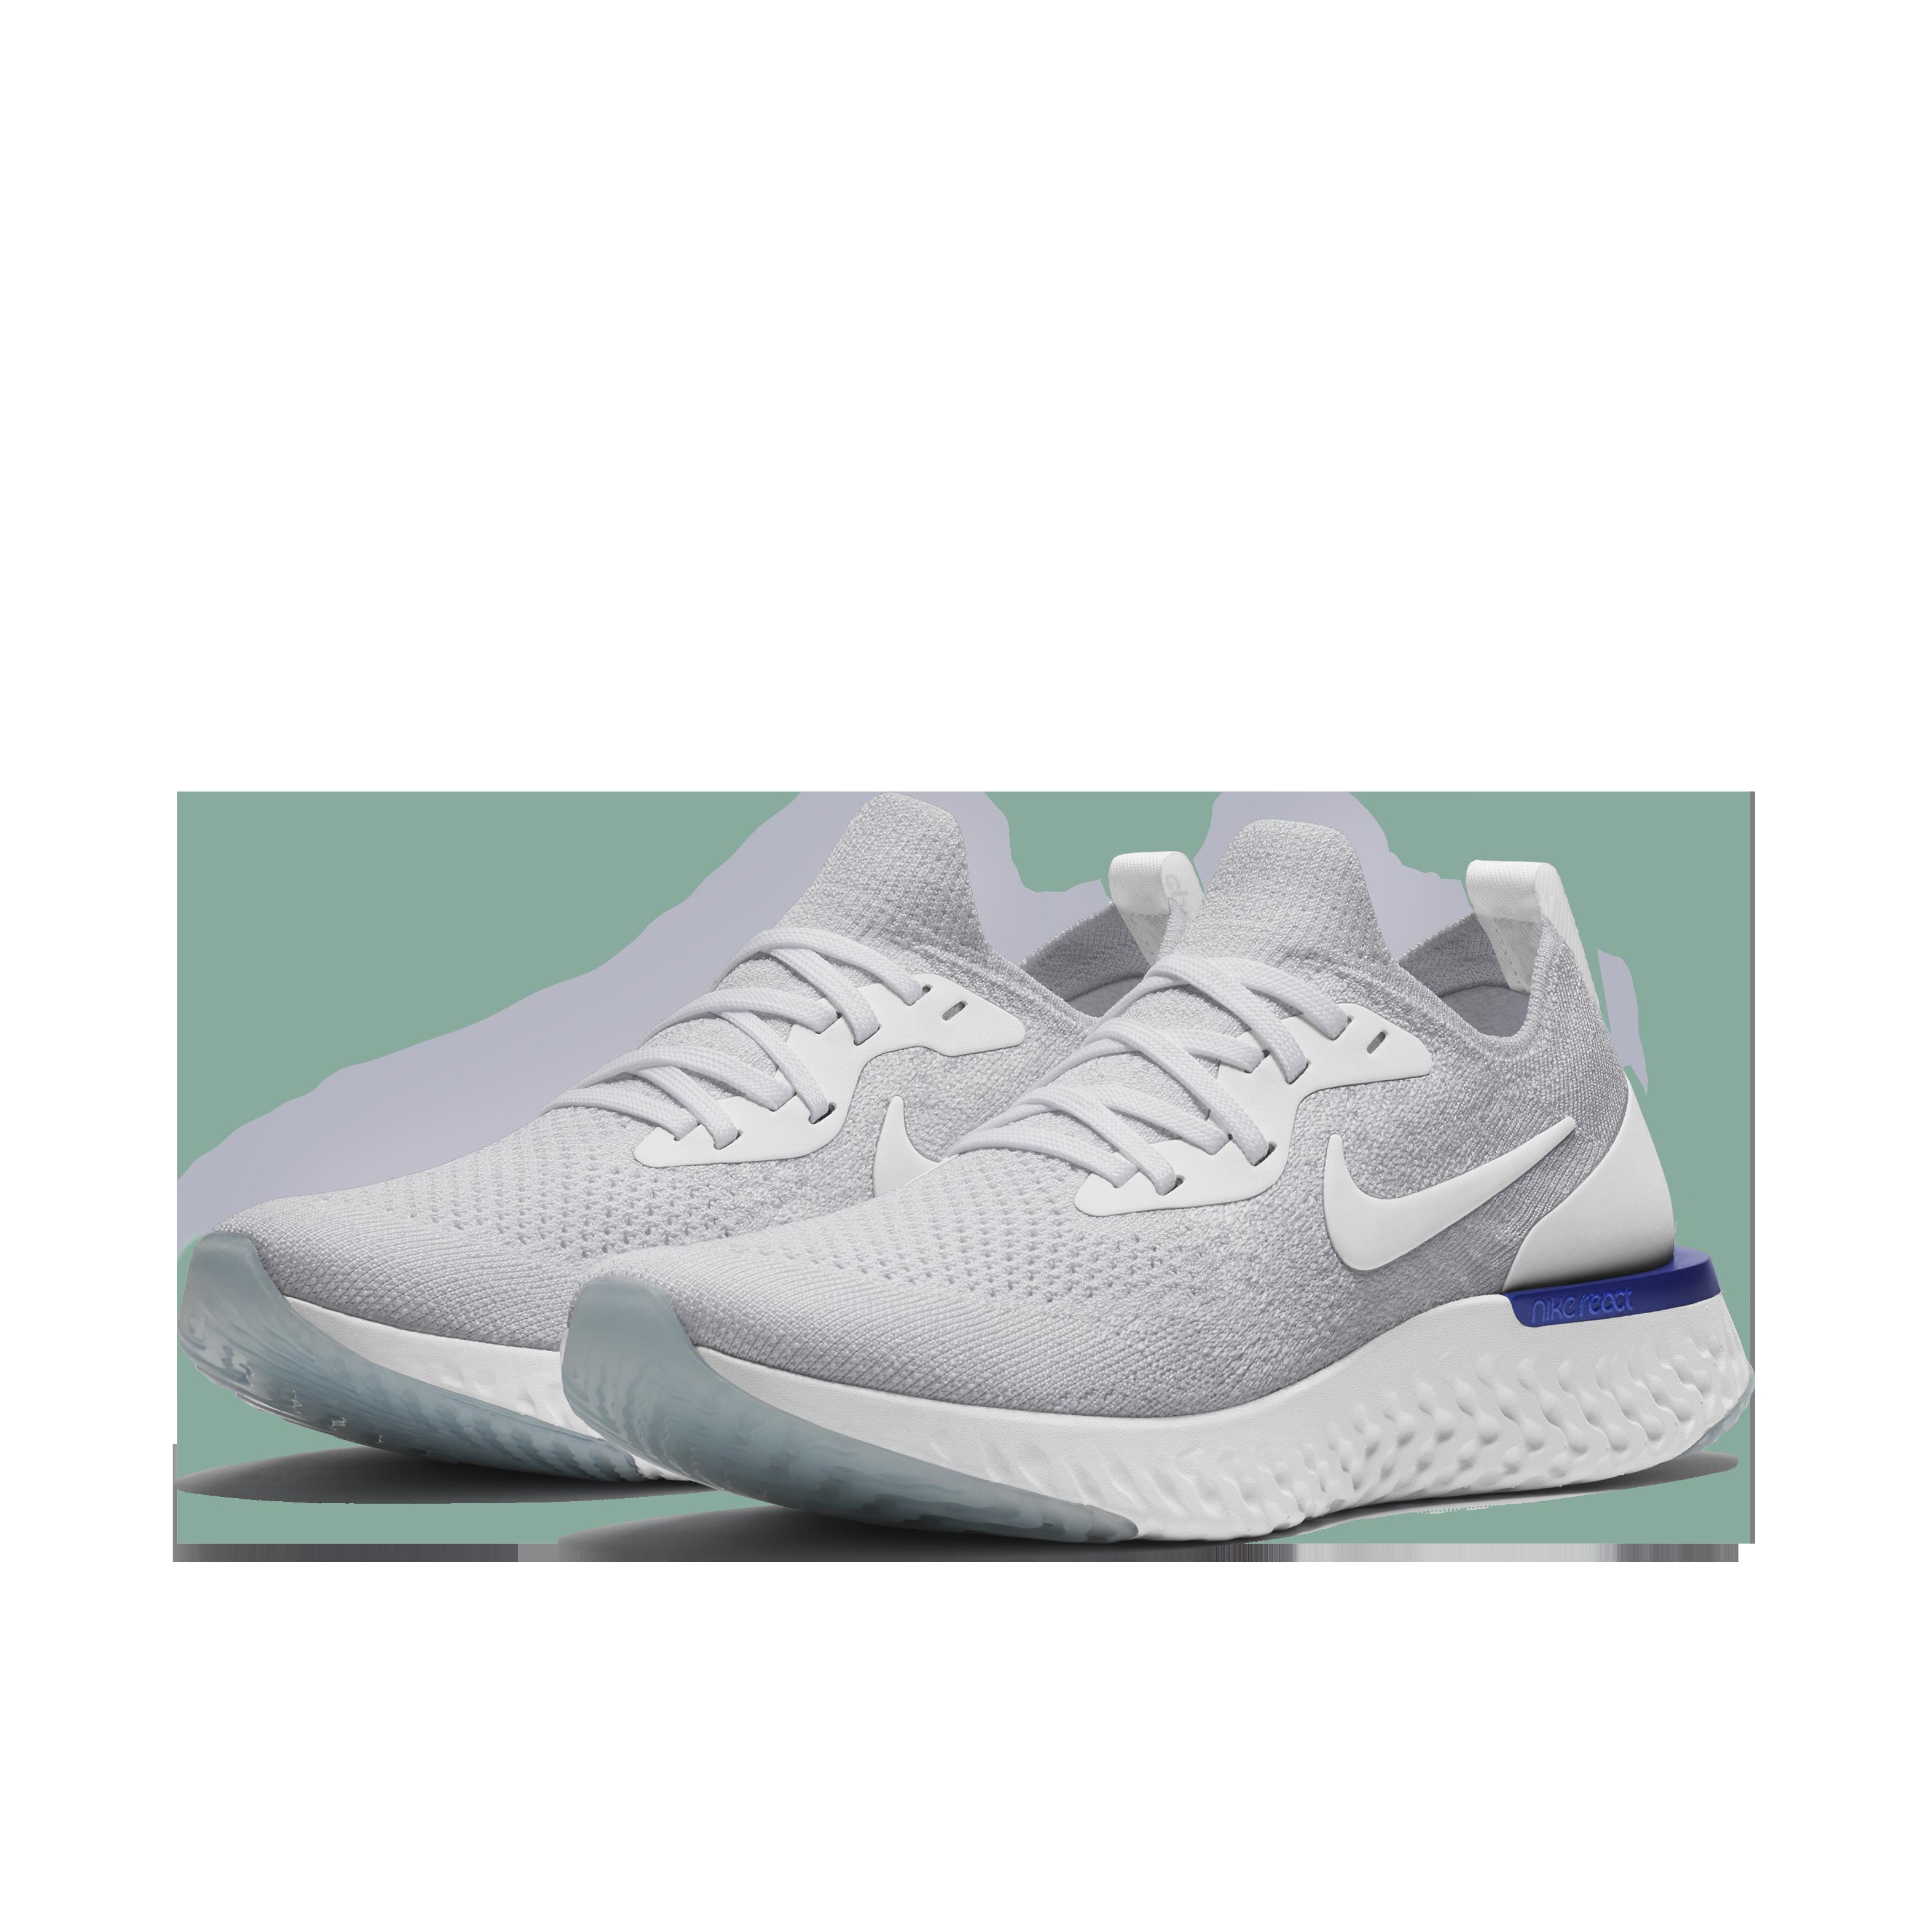 Nike Football-0070